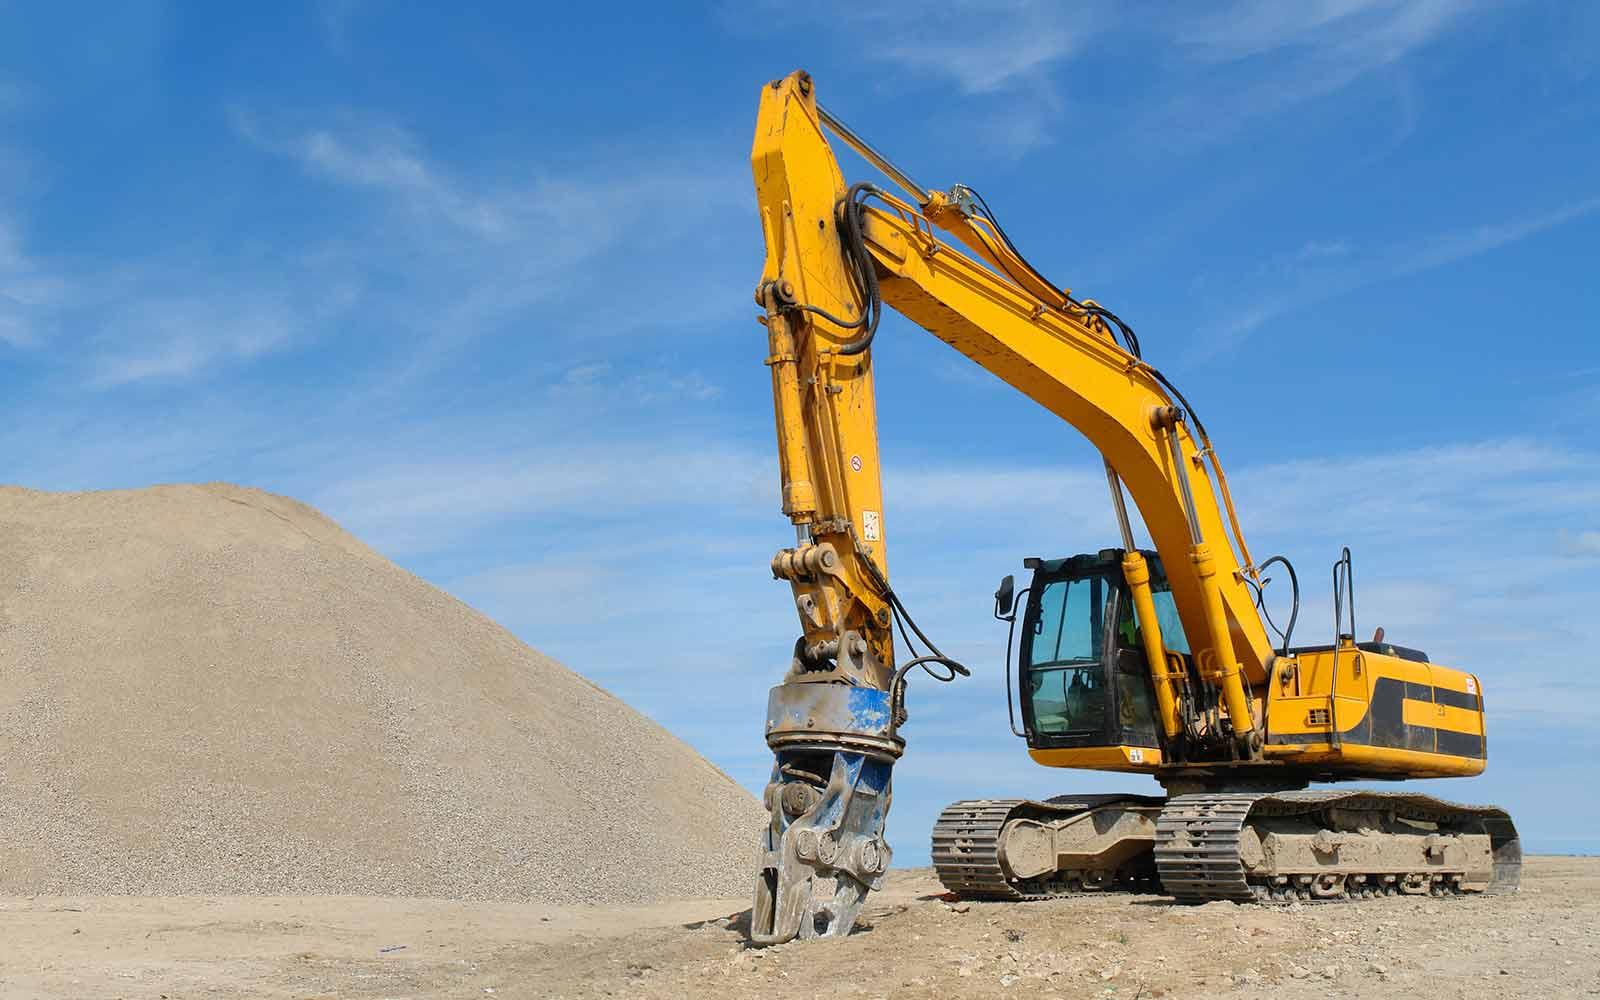 yellow bulldozer ready for work